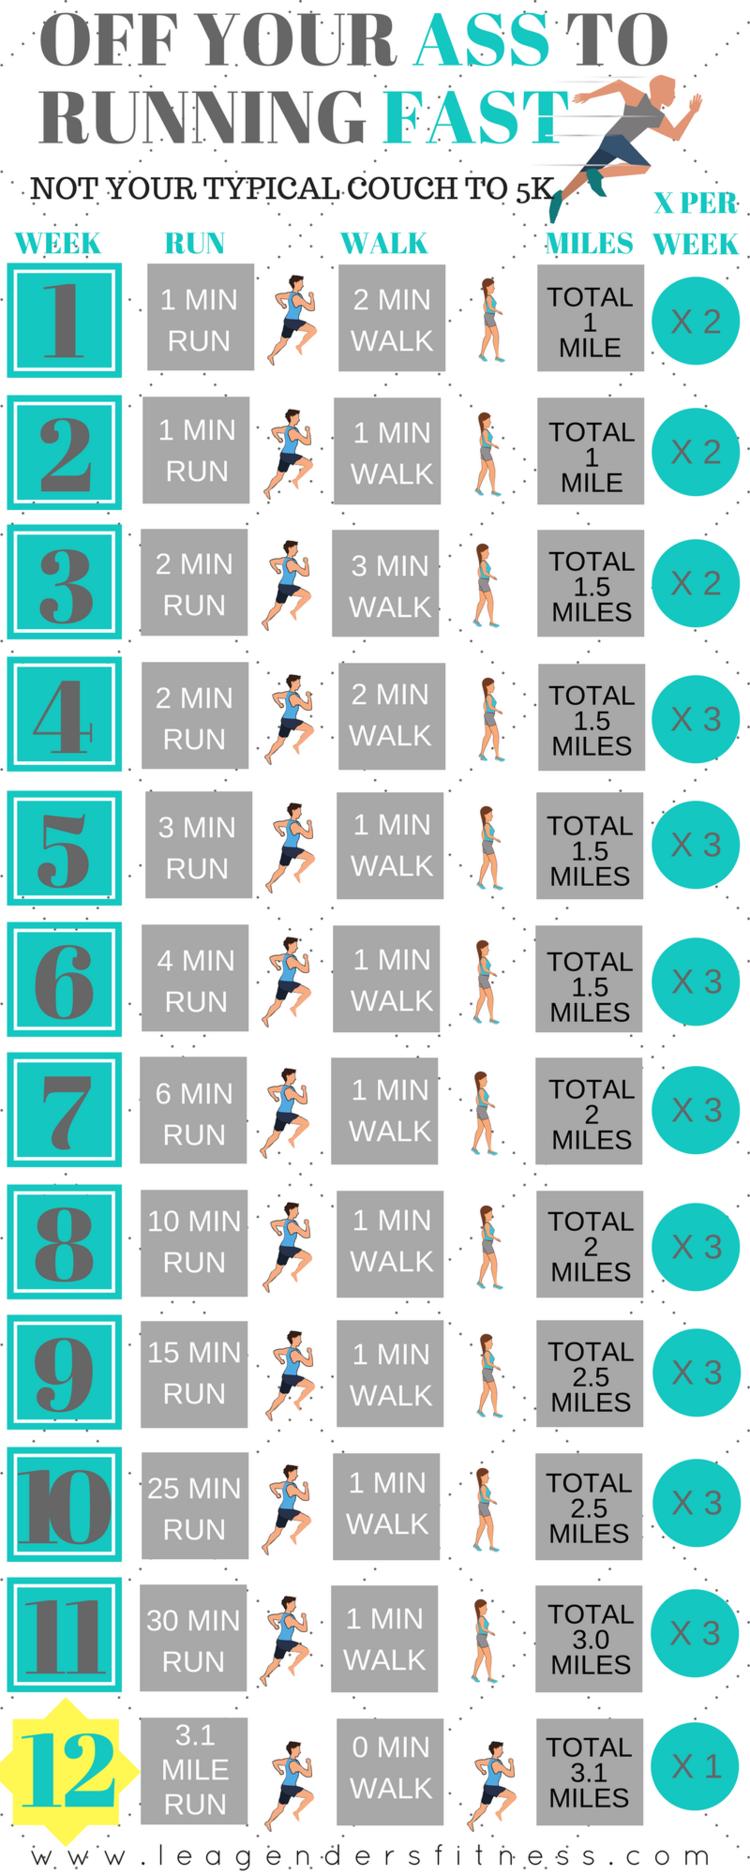 Perdida de peso y masa muscular involuntaria picture 5